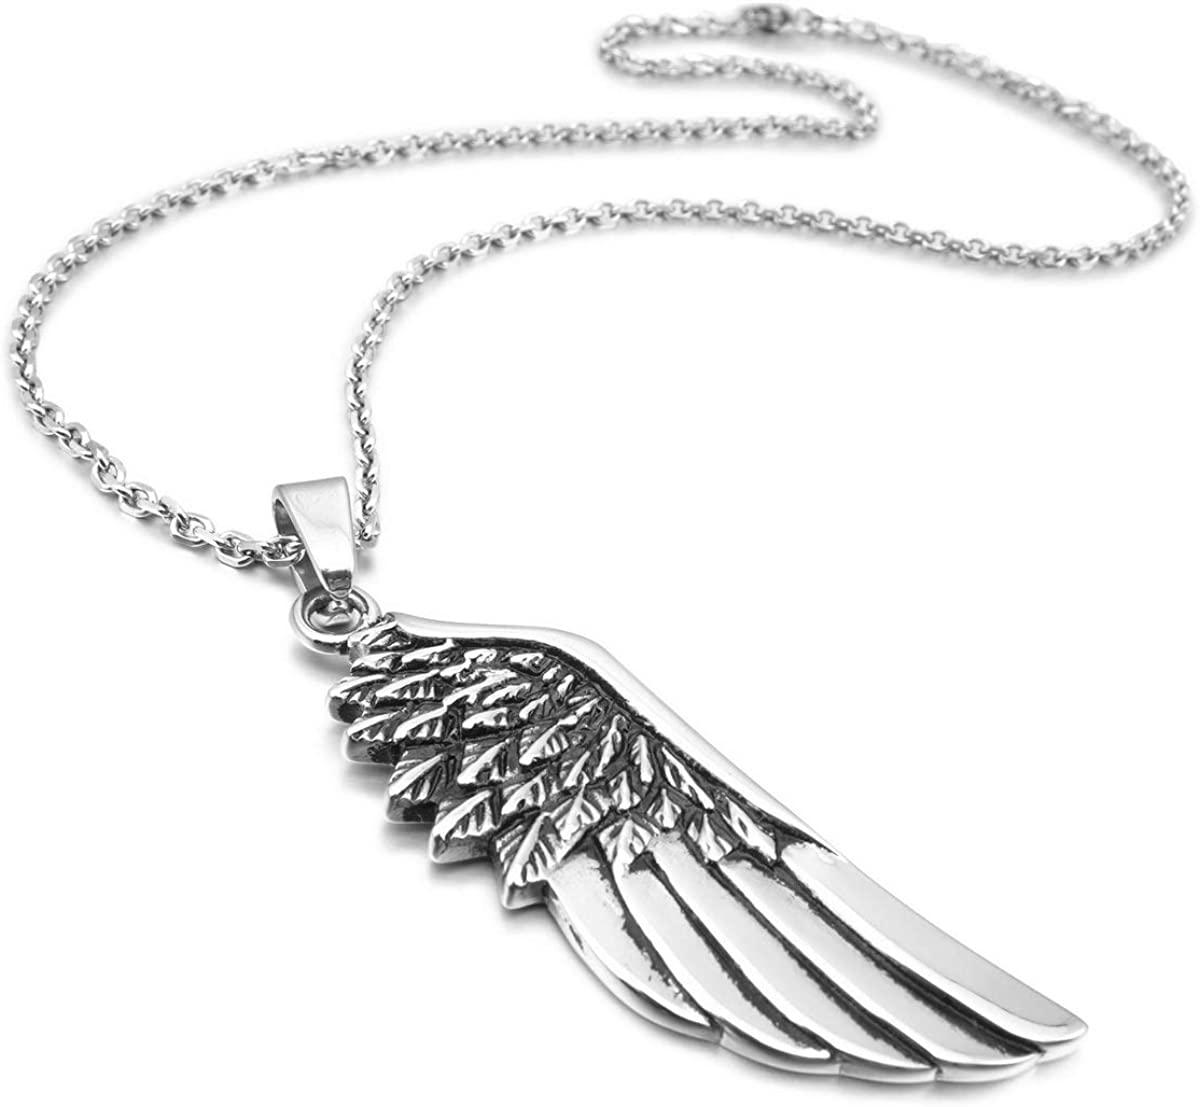 Sterlingsilber Puffy Konkav Feder Engel Flügel Blatt Halskette Verpackt